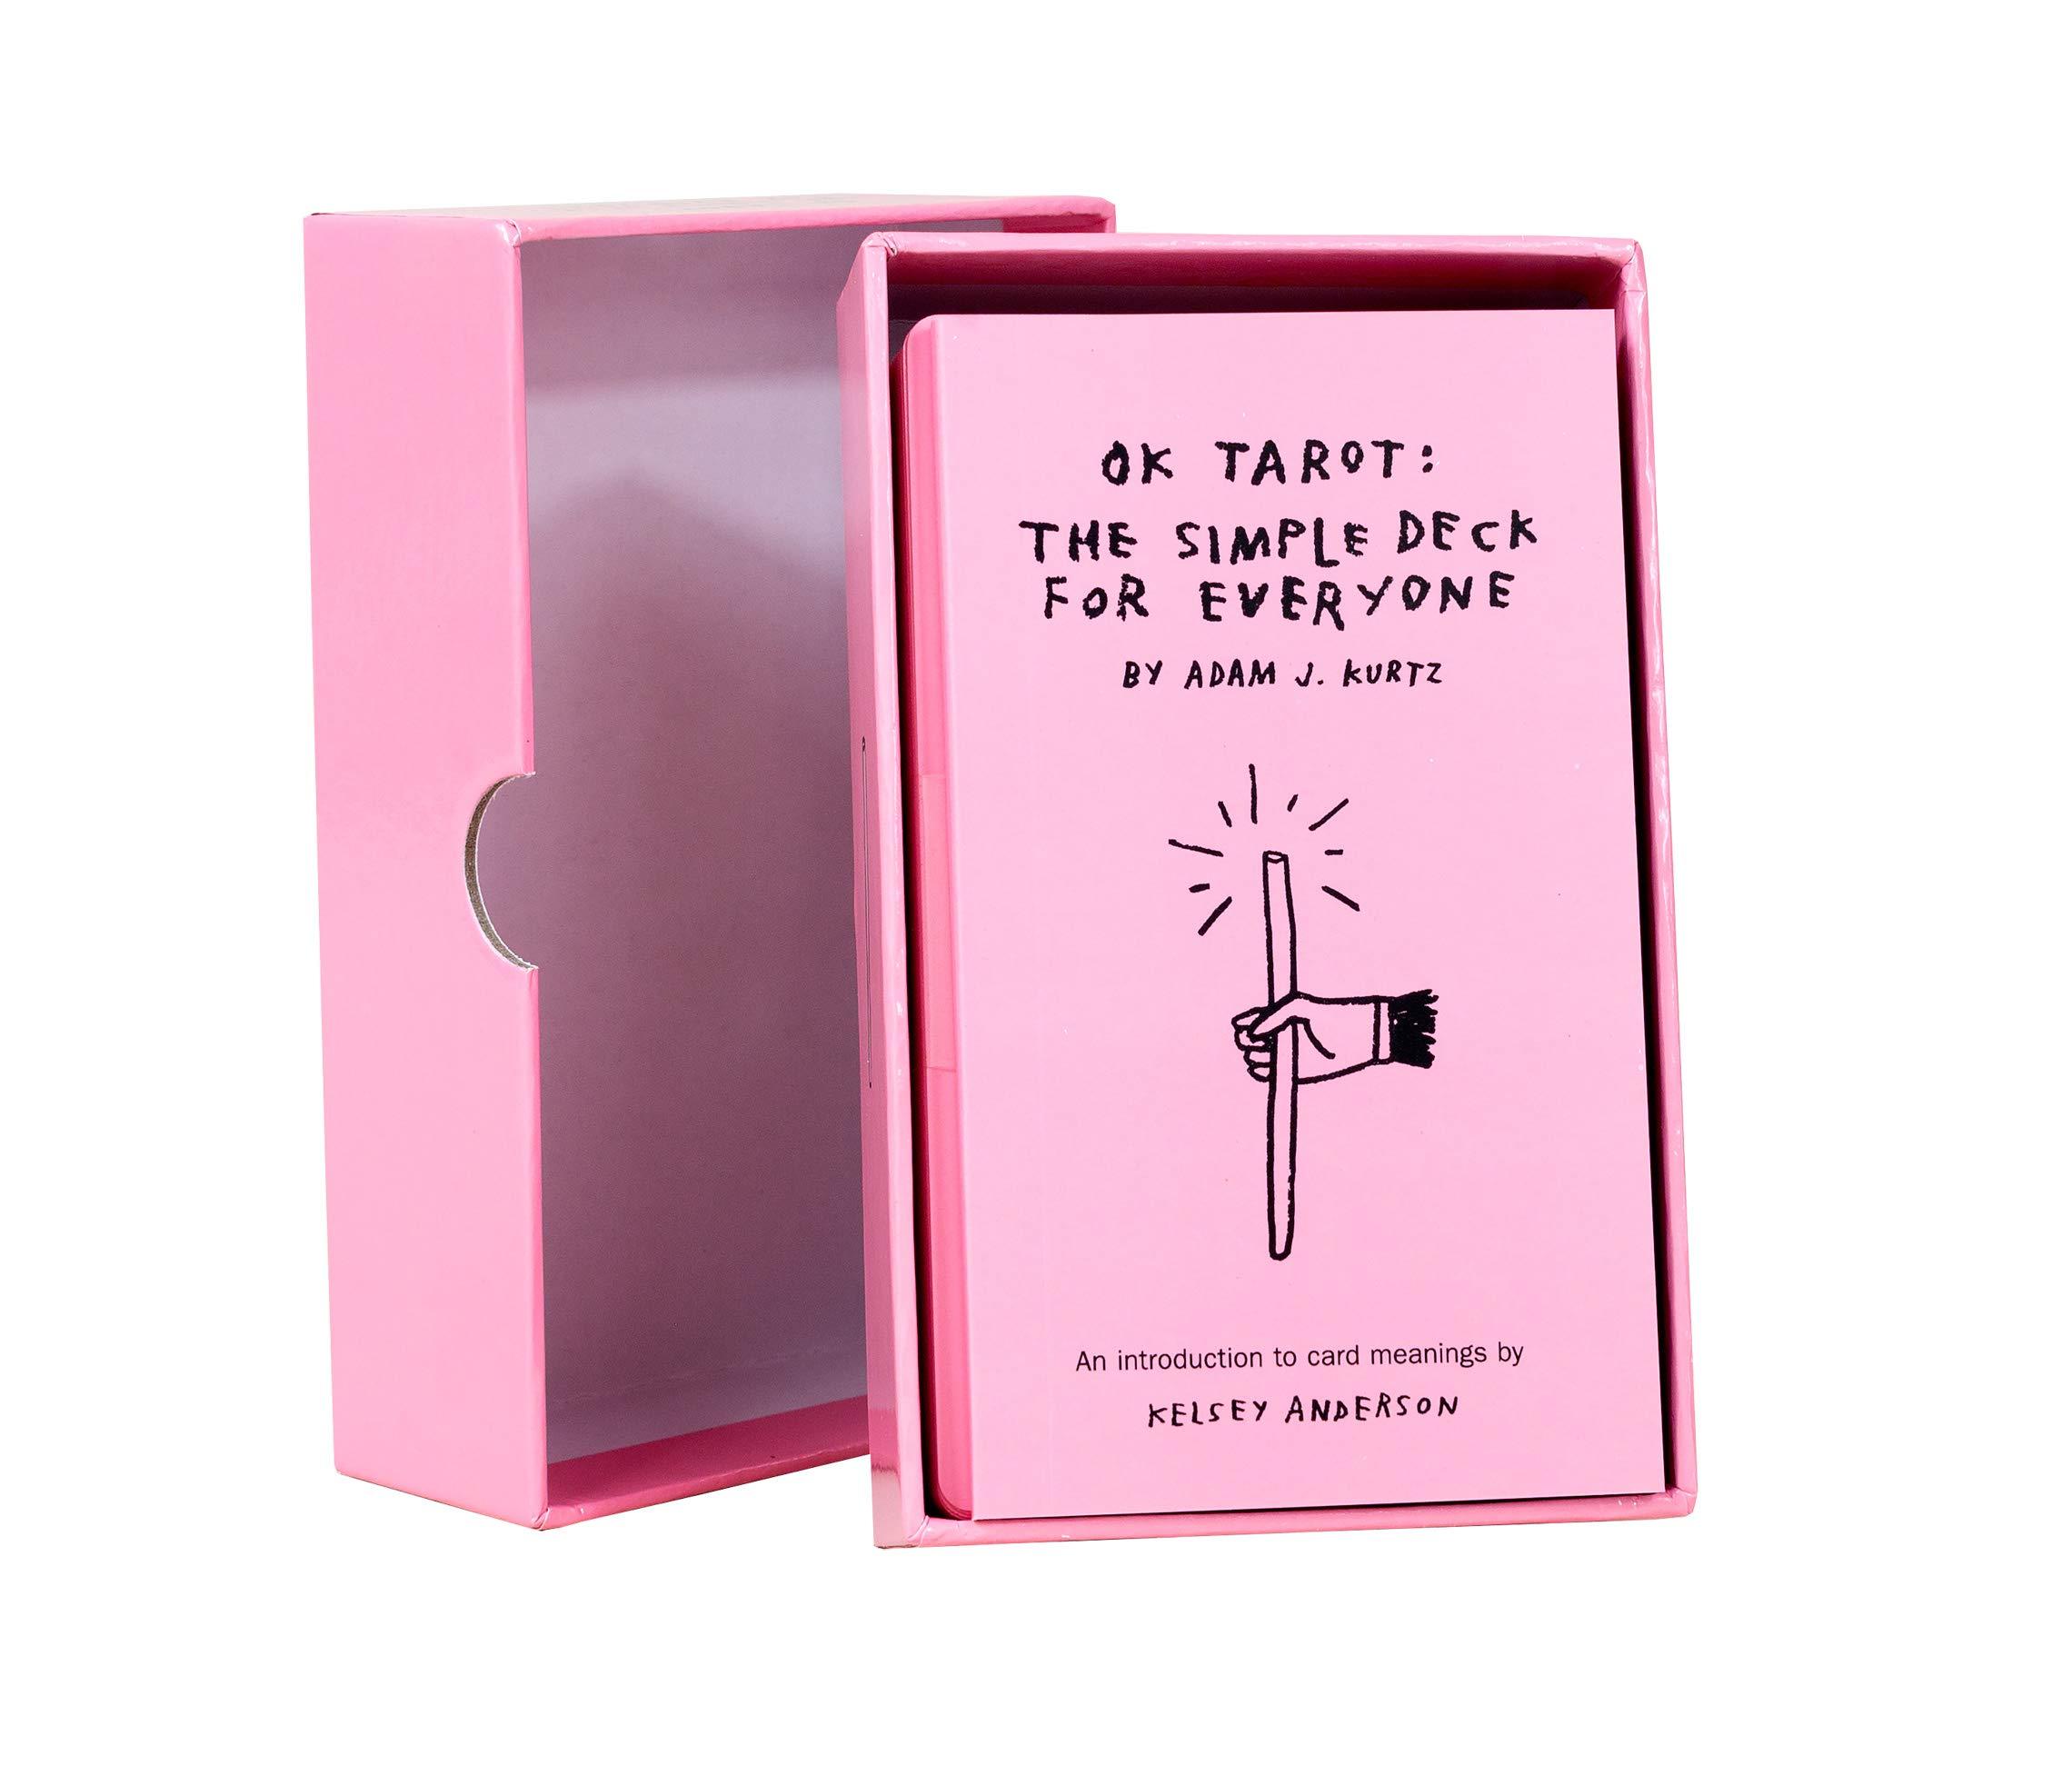 The OK Tarot